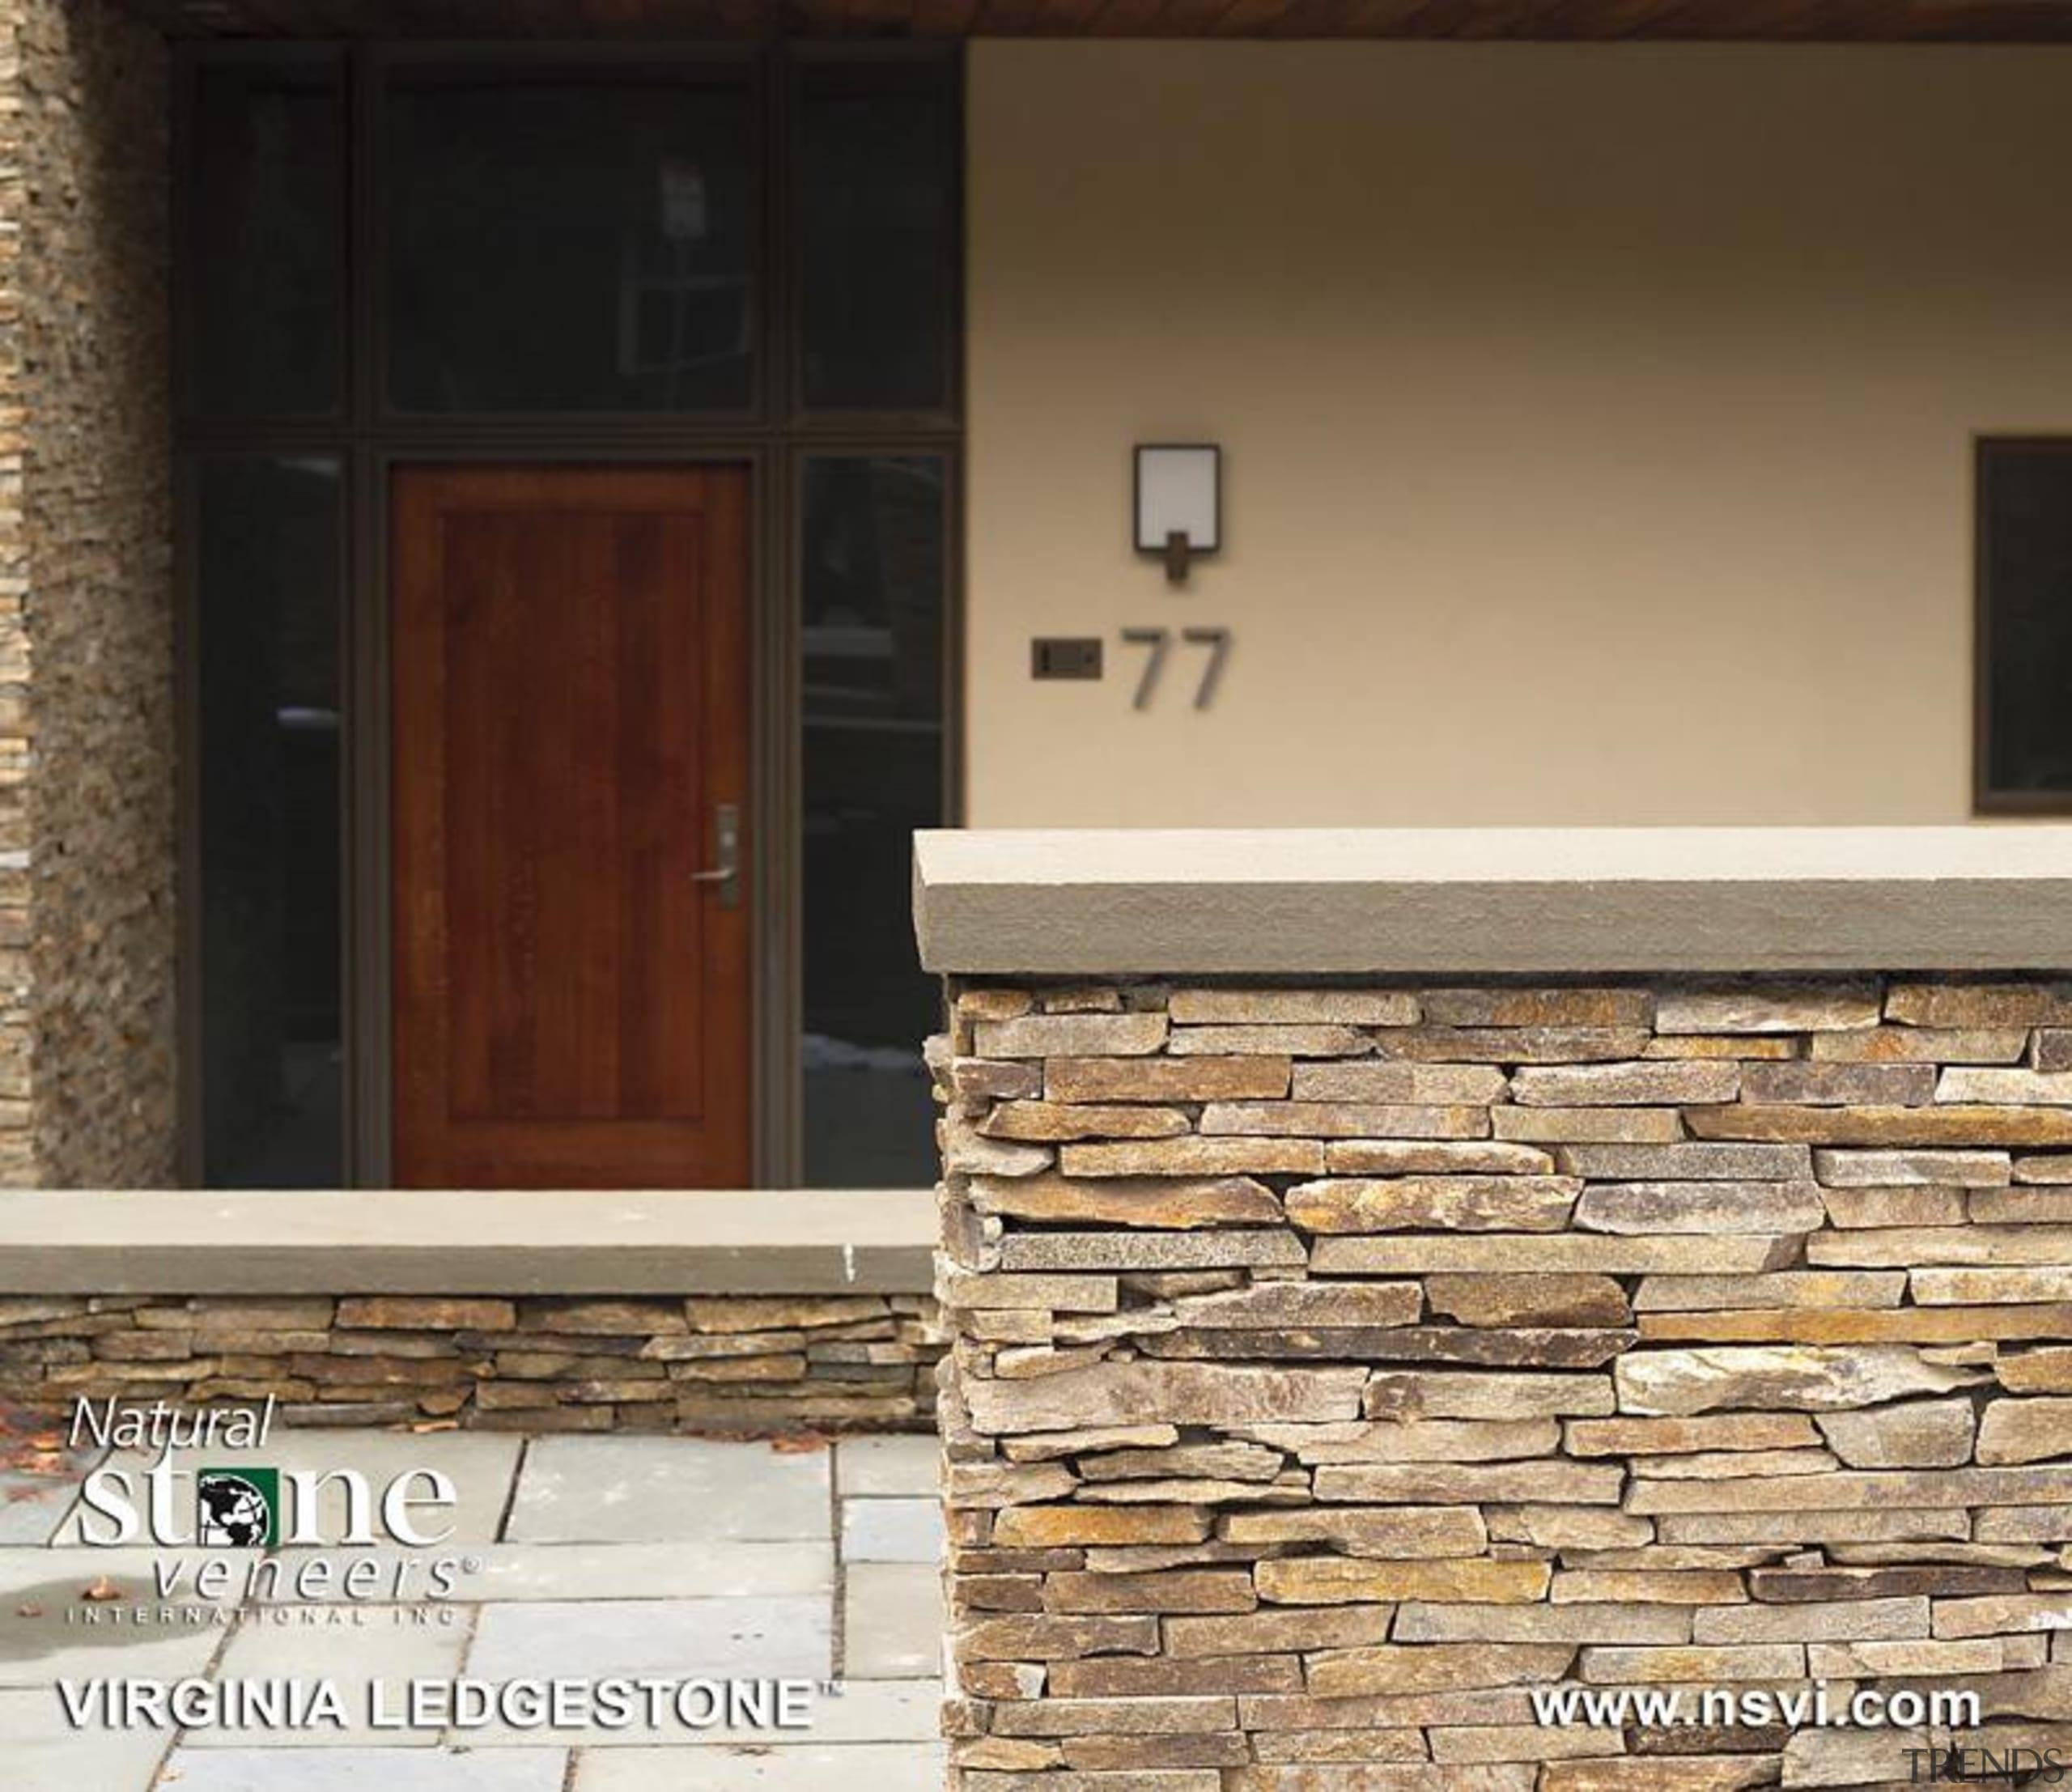 Frank Lloyd Wright Residential Renovation, Cambridge, MANeed to brick, brickwork, floor, flooring, stone wall, wall, window, wood, wood stain, brown